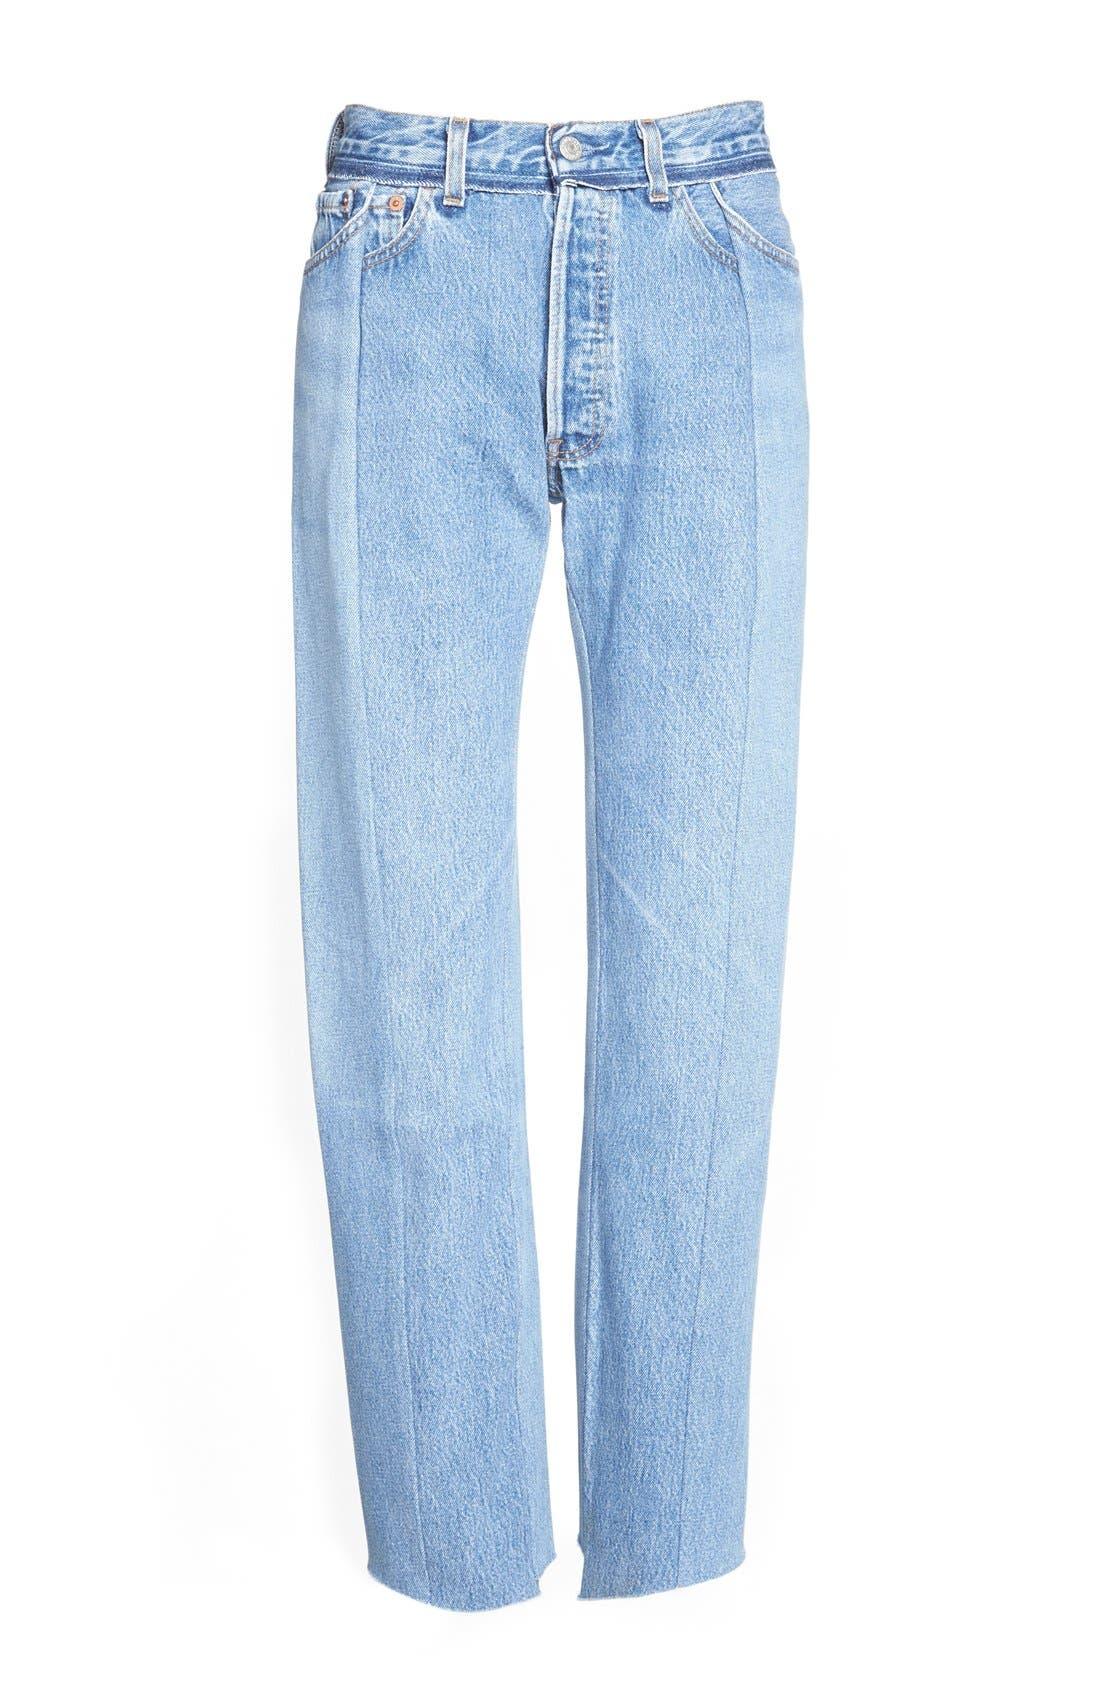 Deconstructed Crop Jeans,                             Main thumbnail 1, color,                             400